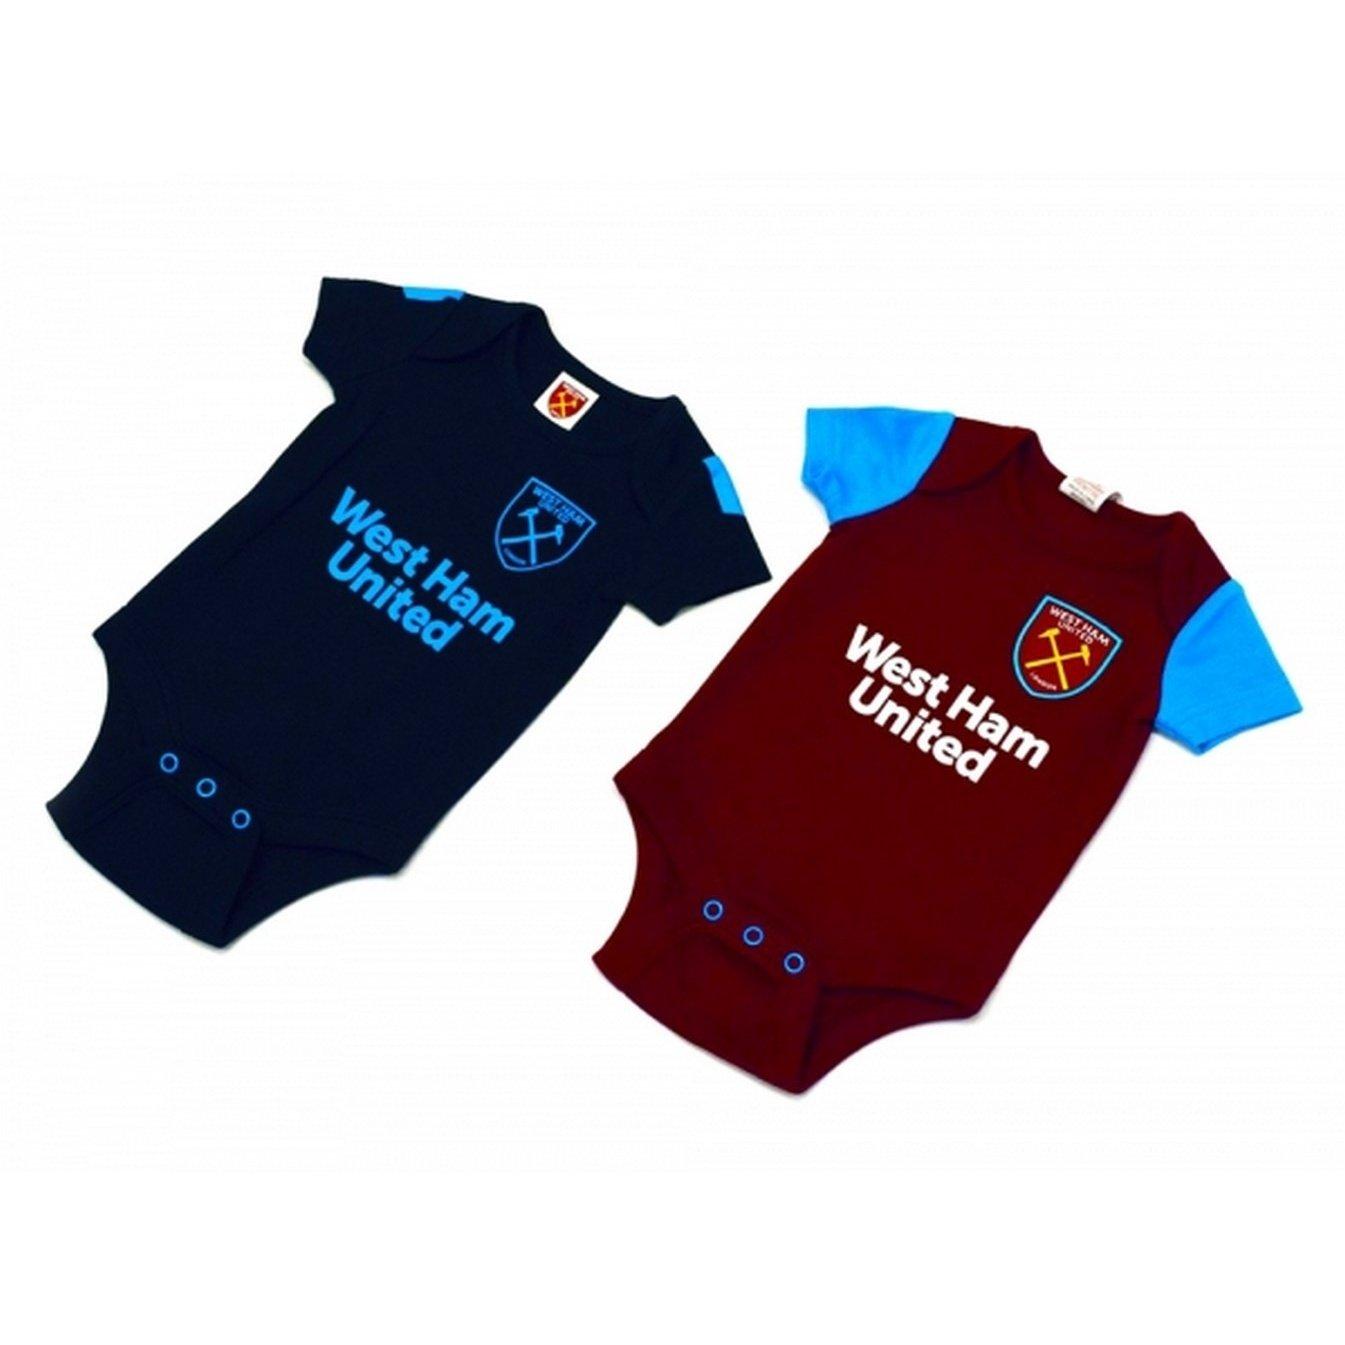 West Ham Unitedベビーボディスーツ2017 / 18 B076KMP5MK12 18 Months